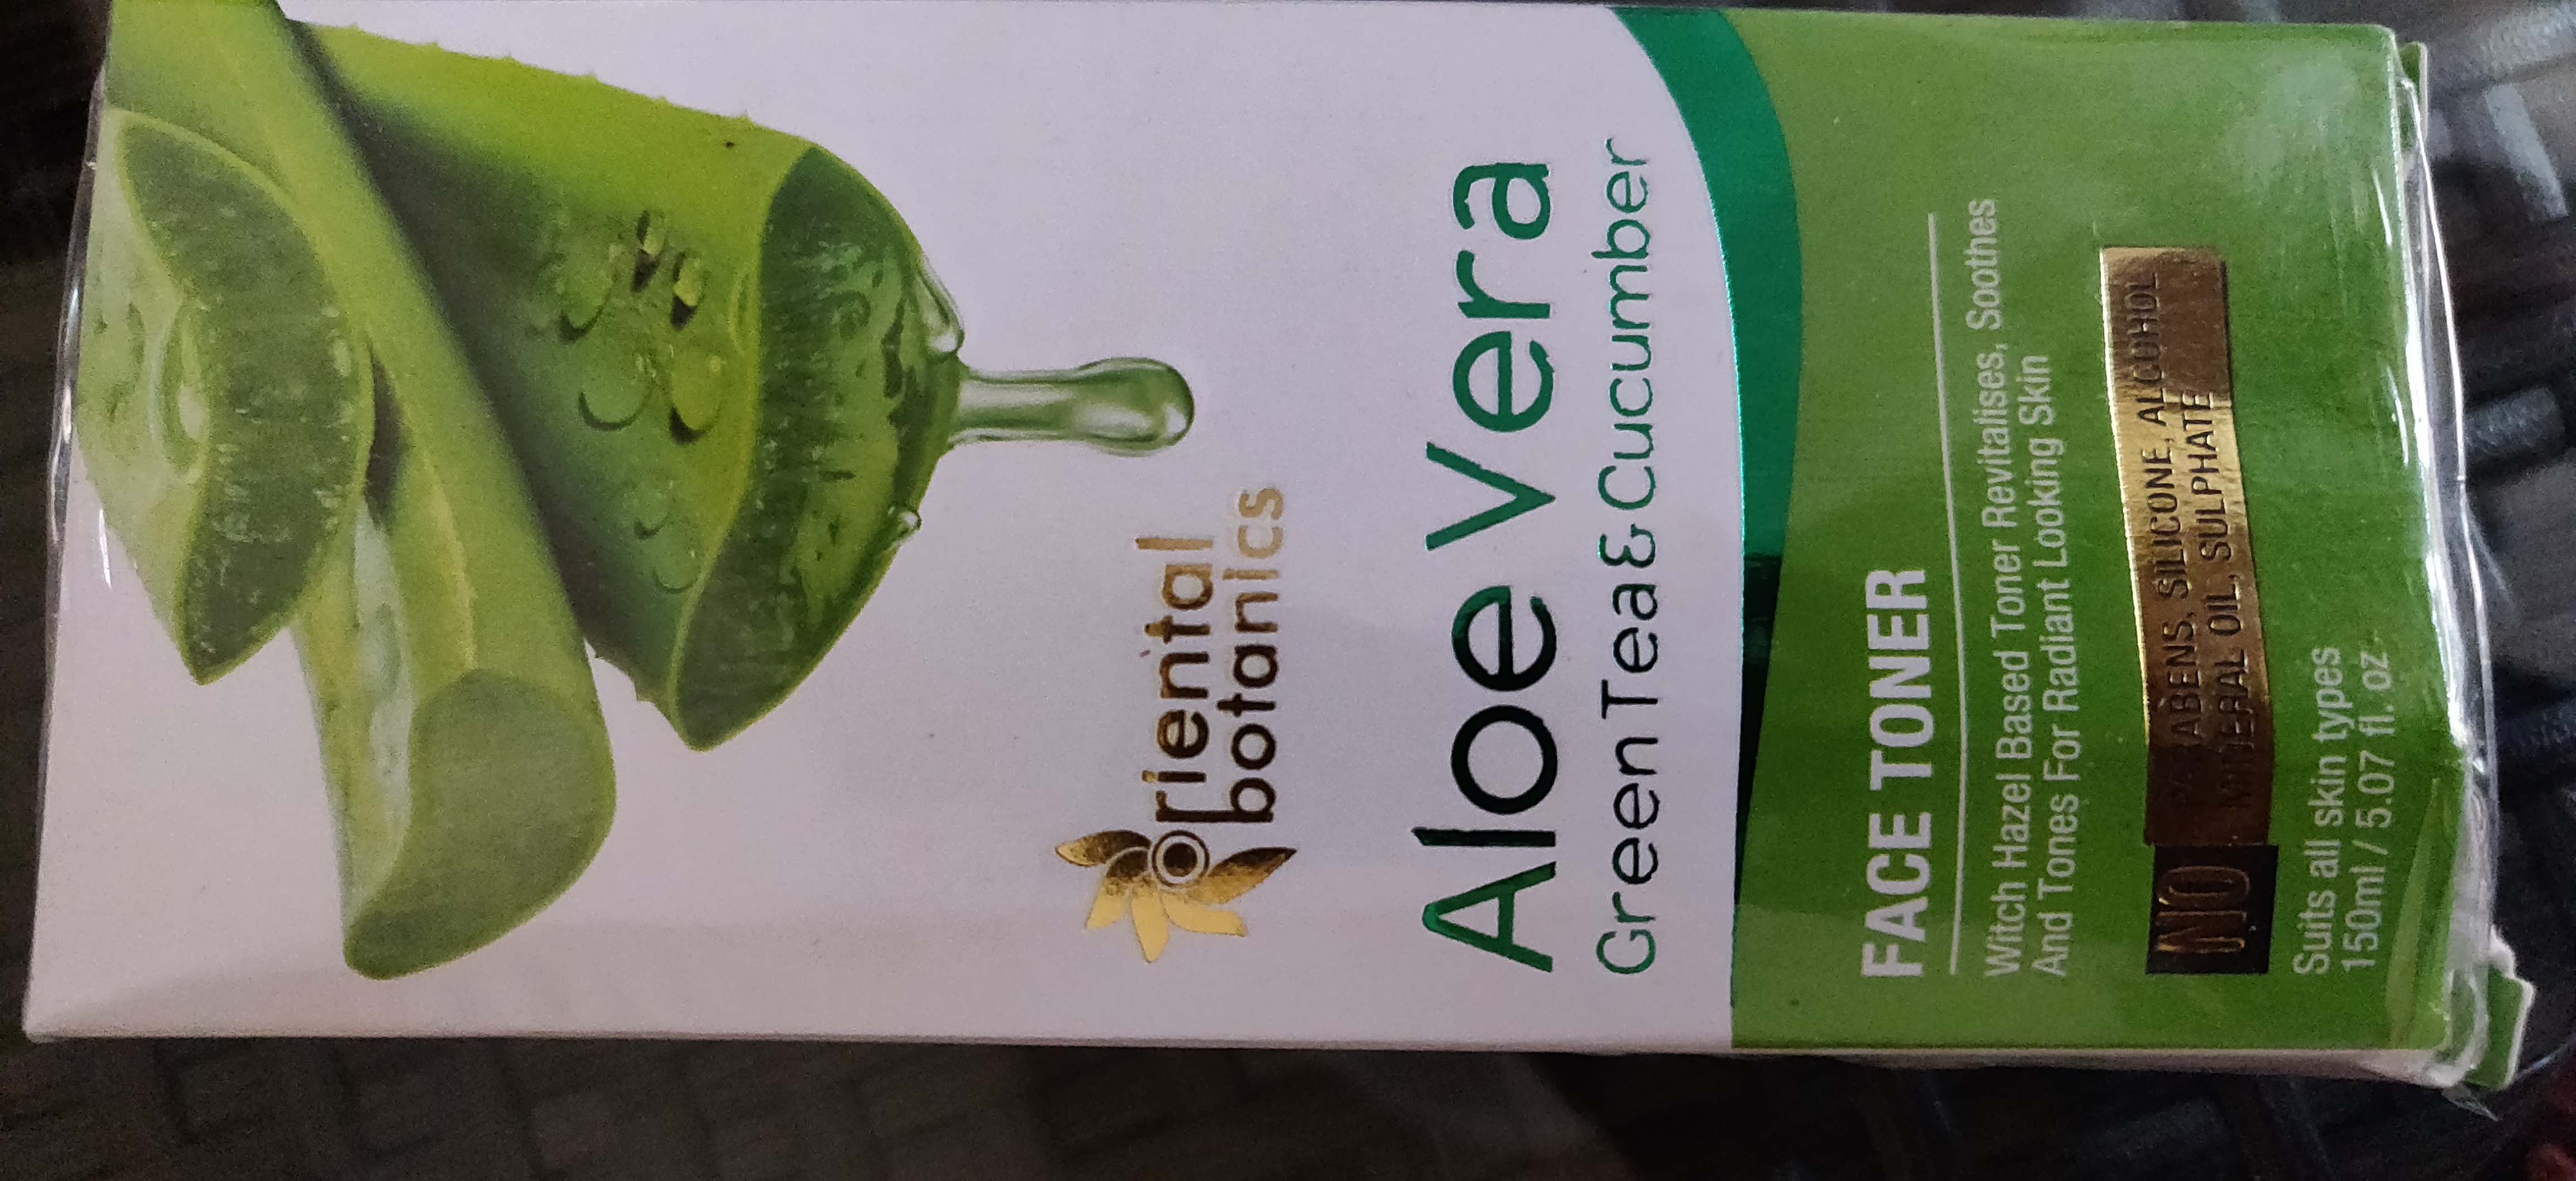 Oriental Botanics Aloe Vera Green Tea & Cucumber Sunscreen SPF 50-A Great Natural Face Toner-By riya_agrawal-2